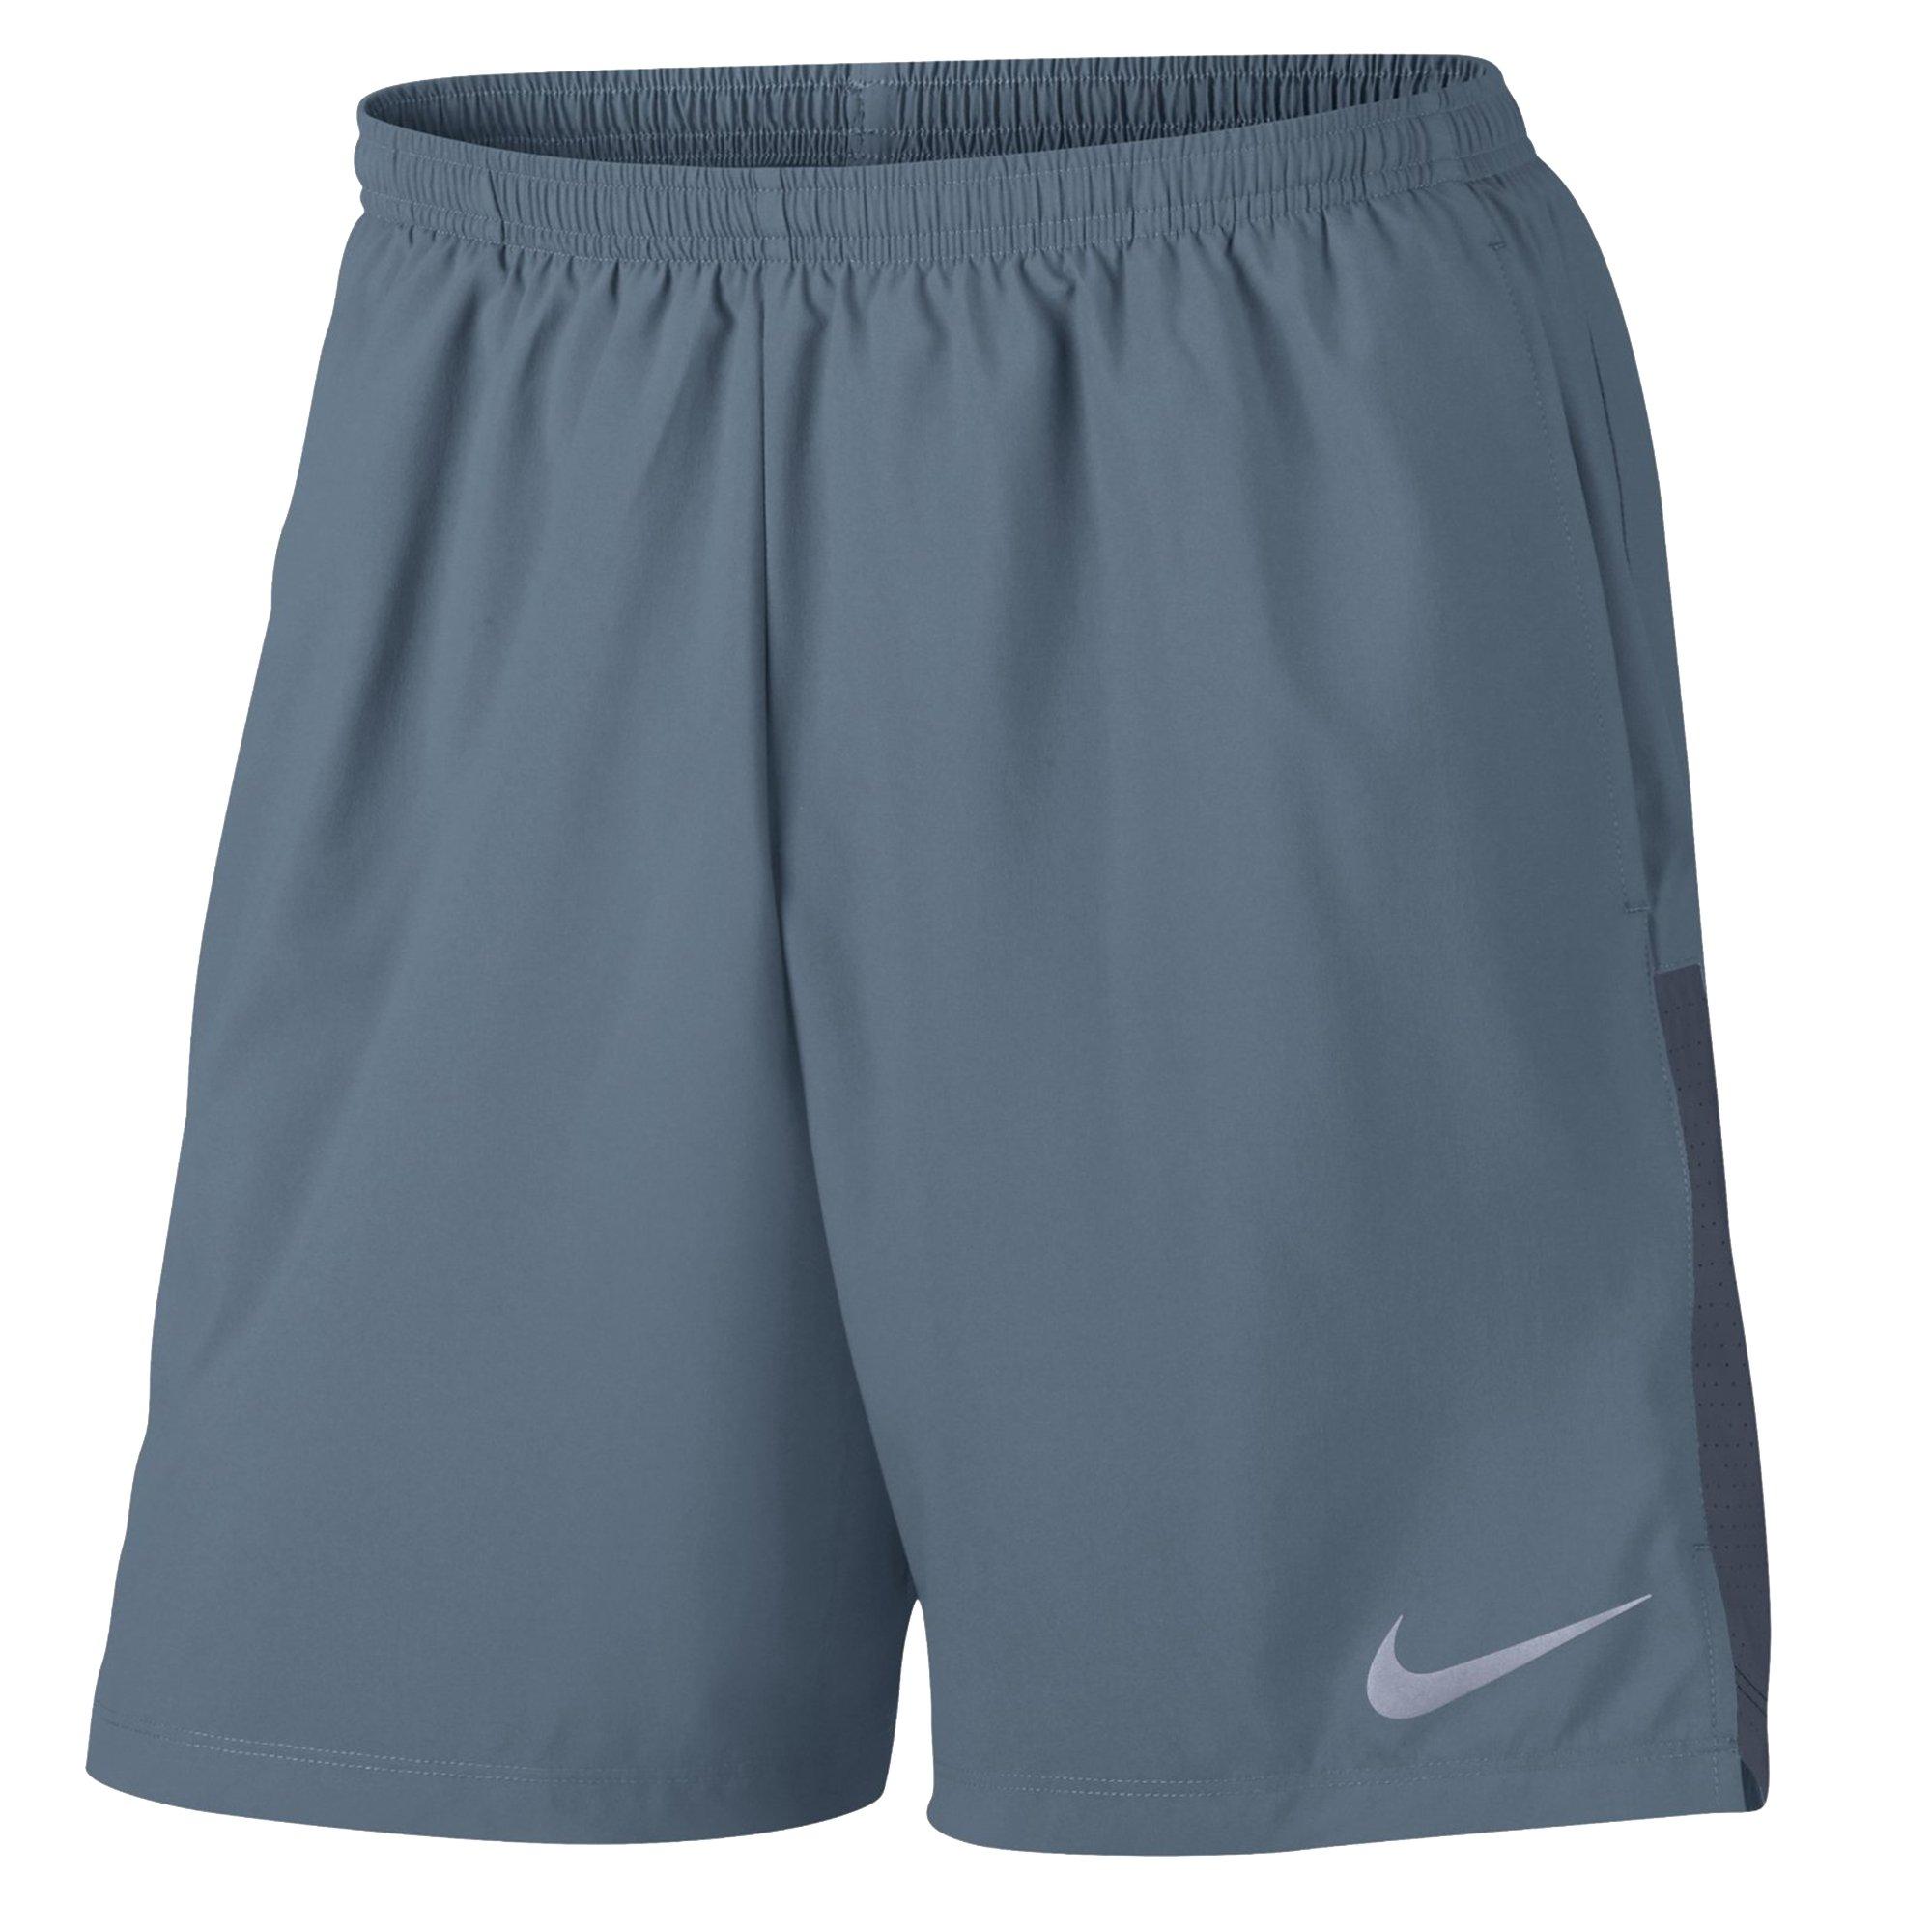 Nike Flex 7'' Running Short Armory Blue/Thunder Blue Men's Shorts by Nike